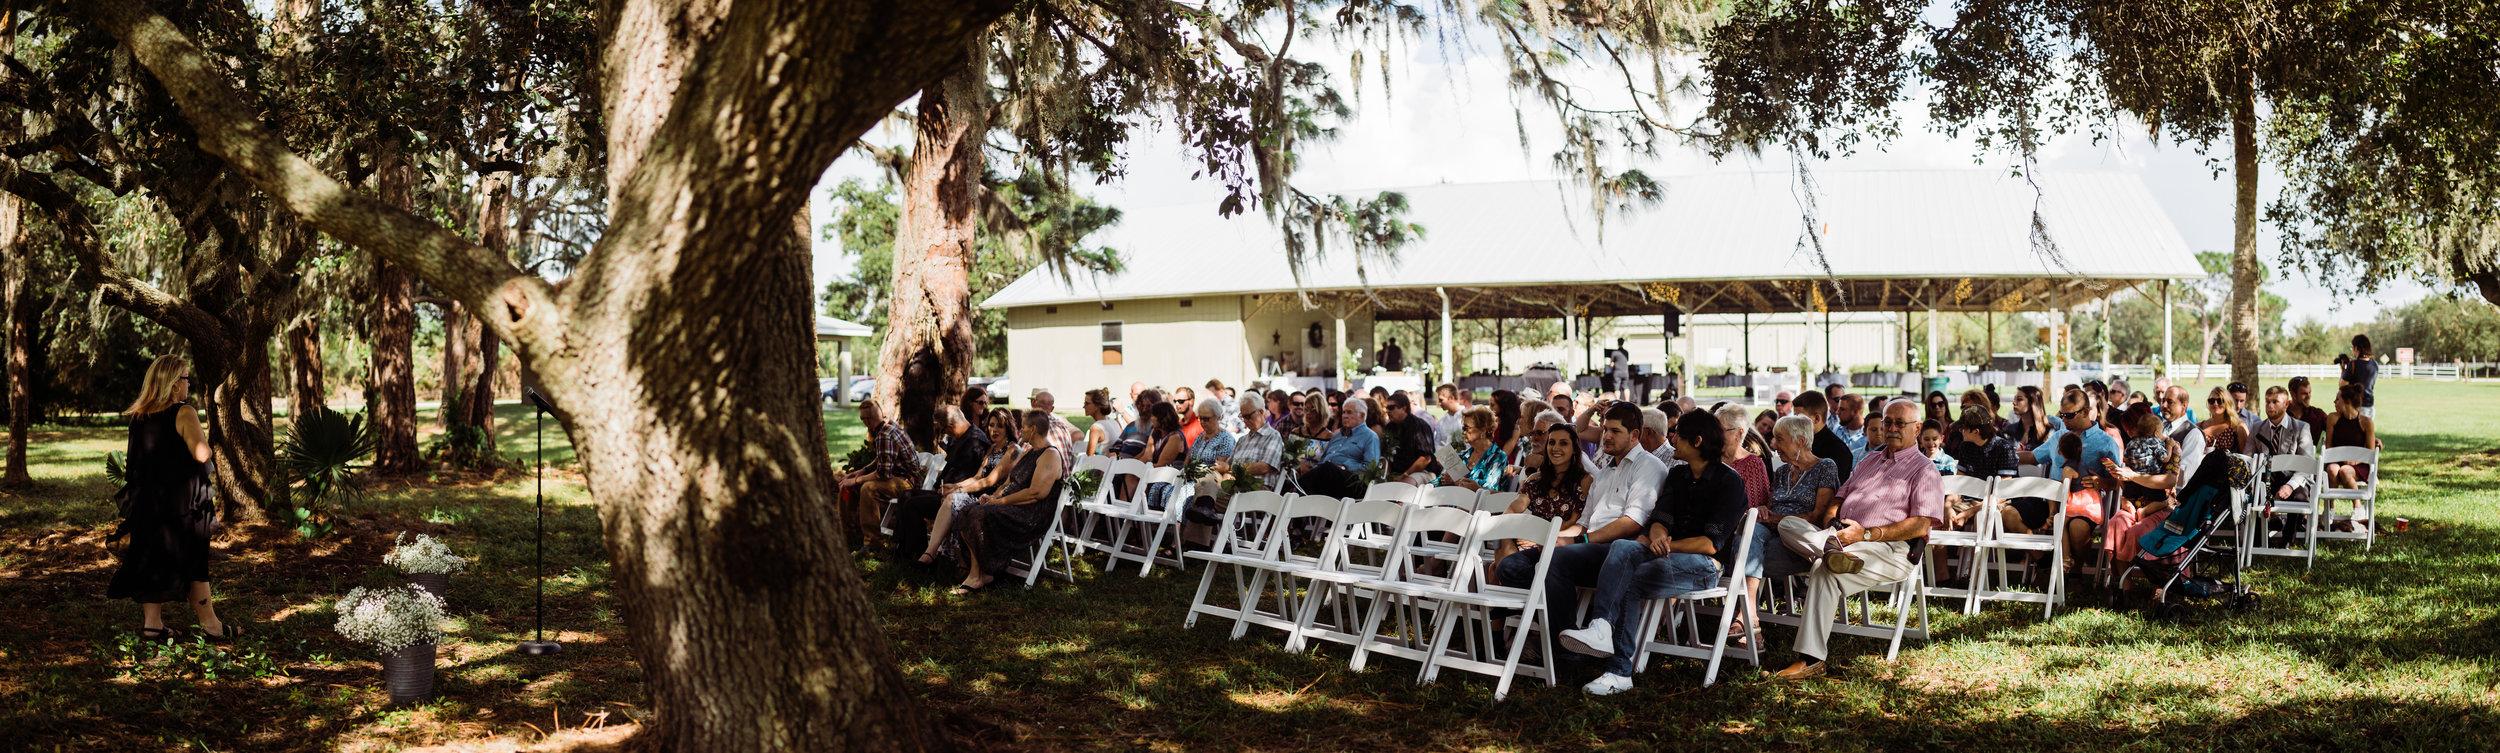 2017.10.14 Samantha and Matthew Crabtree Sarasota Wedding (101 of 708).jpg